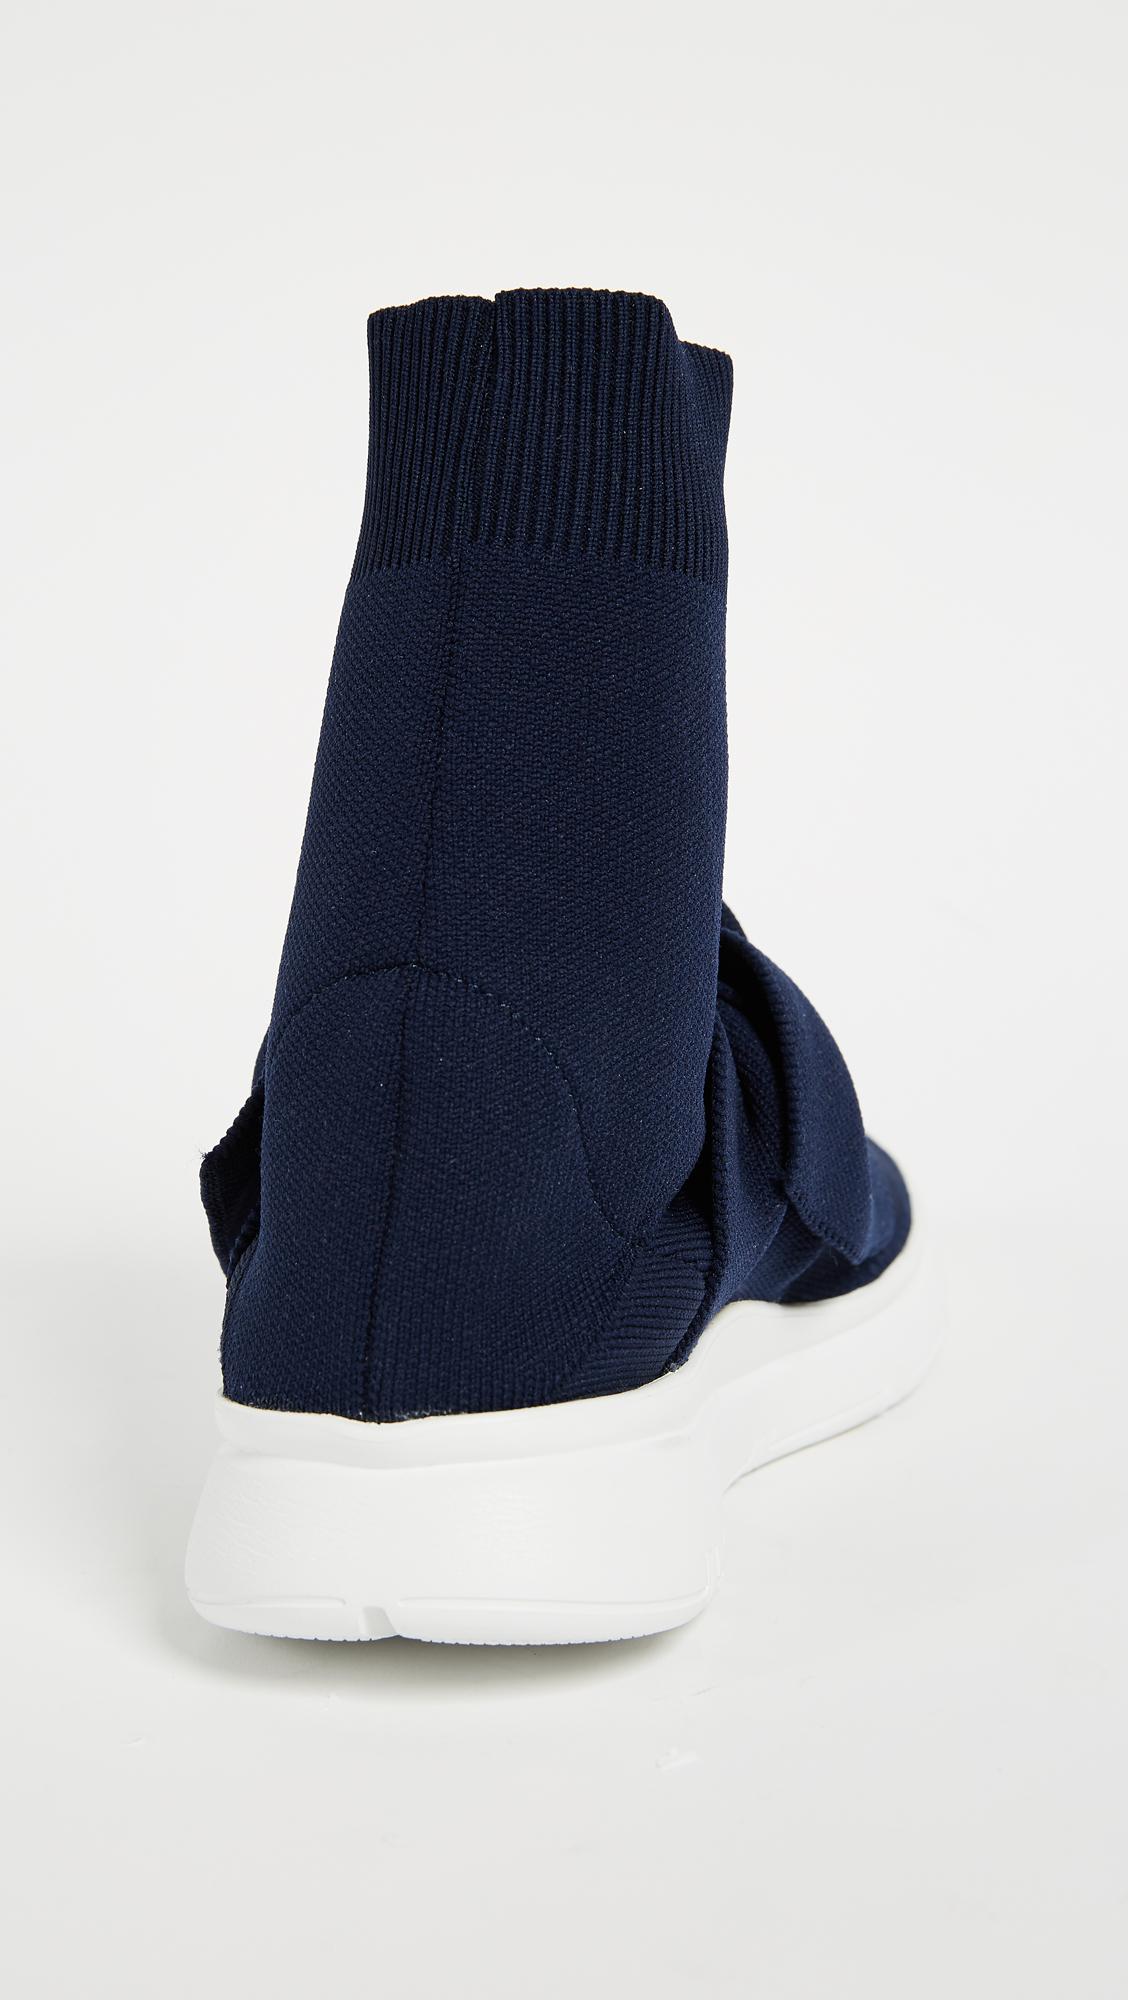 Blue stretch knitted sneakers Joshua Sanders 1Ik2DBr7